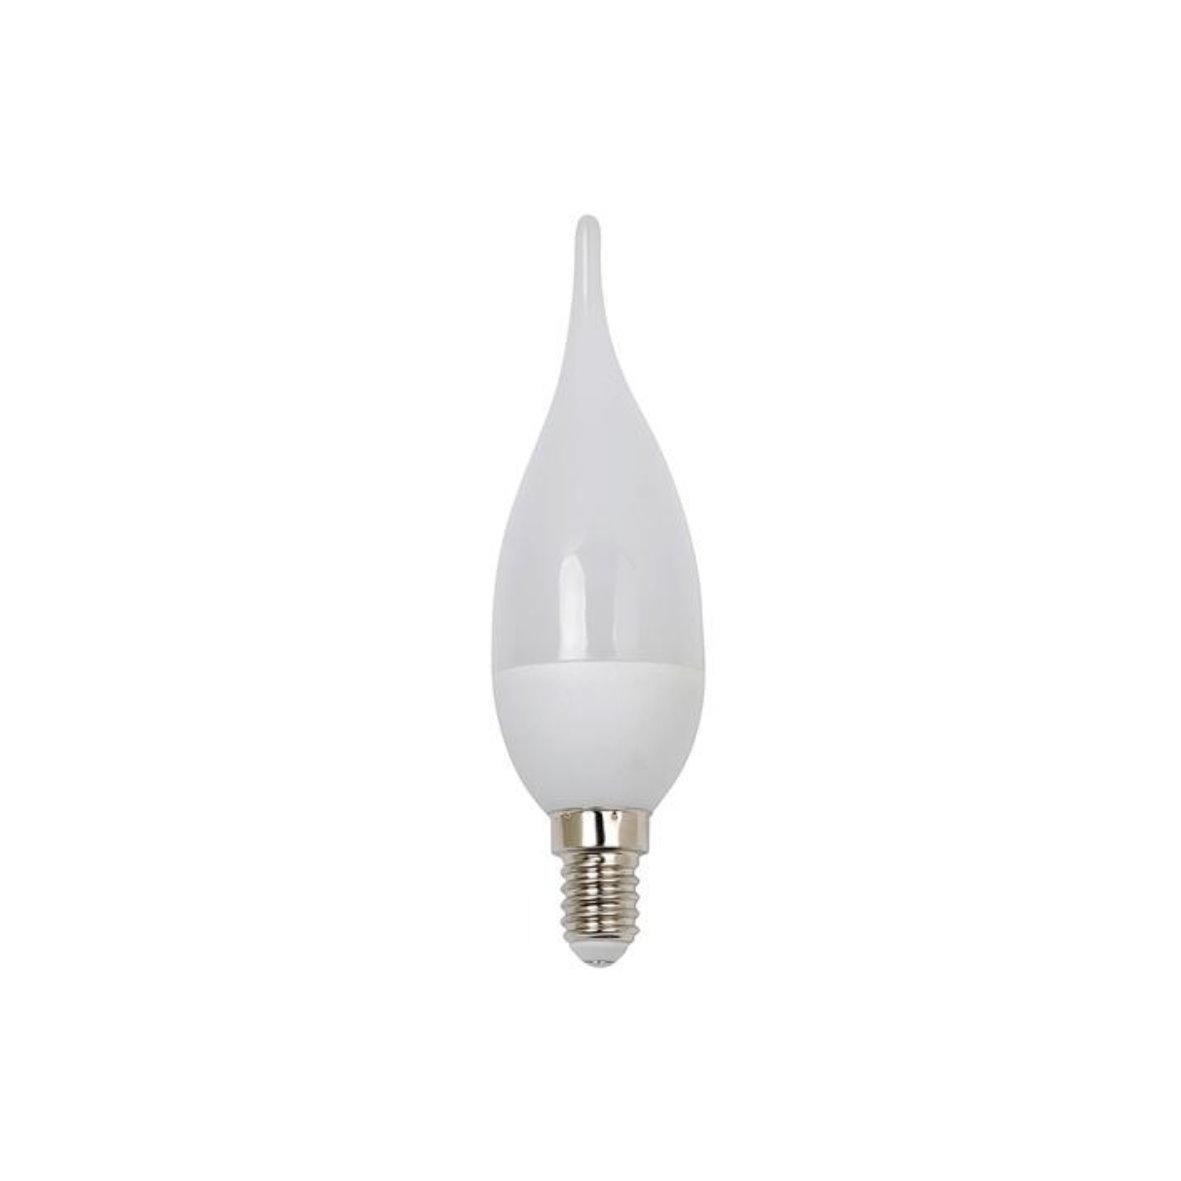 led leuchtmittel smd matt spot strahler lampe highlumen globe sockel glas opal ebay. Black Bedroom Furniture Sets. Home Design Ideas